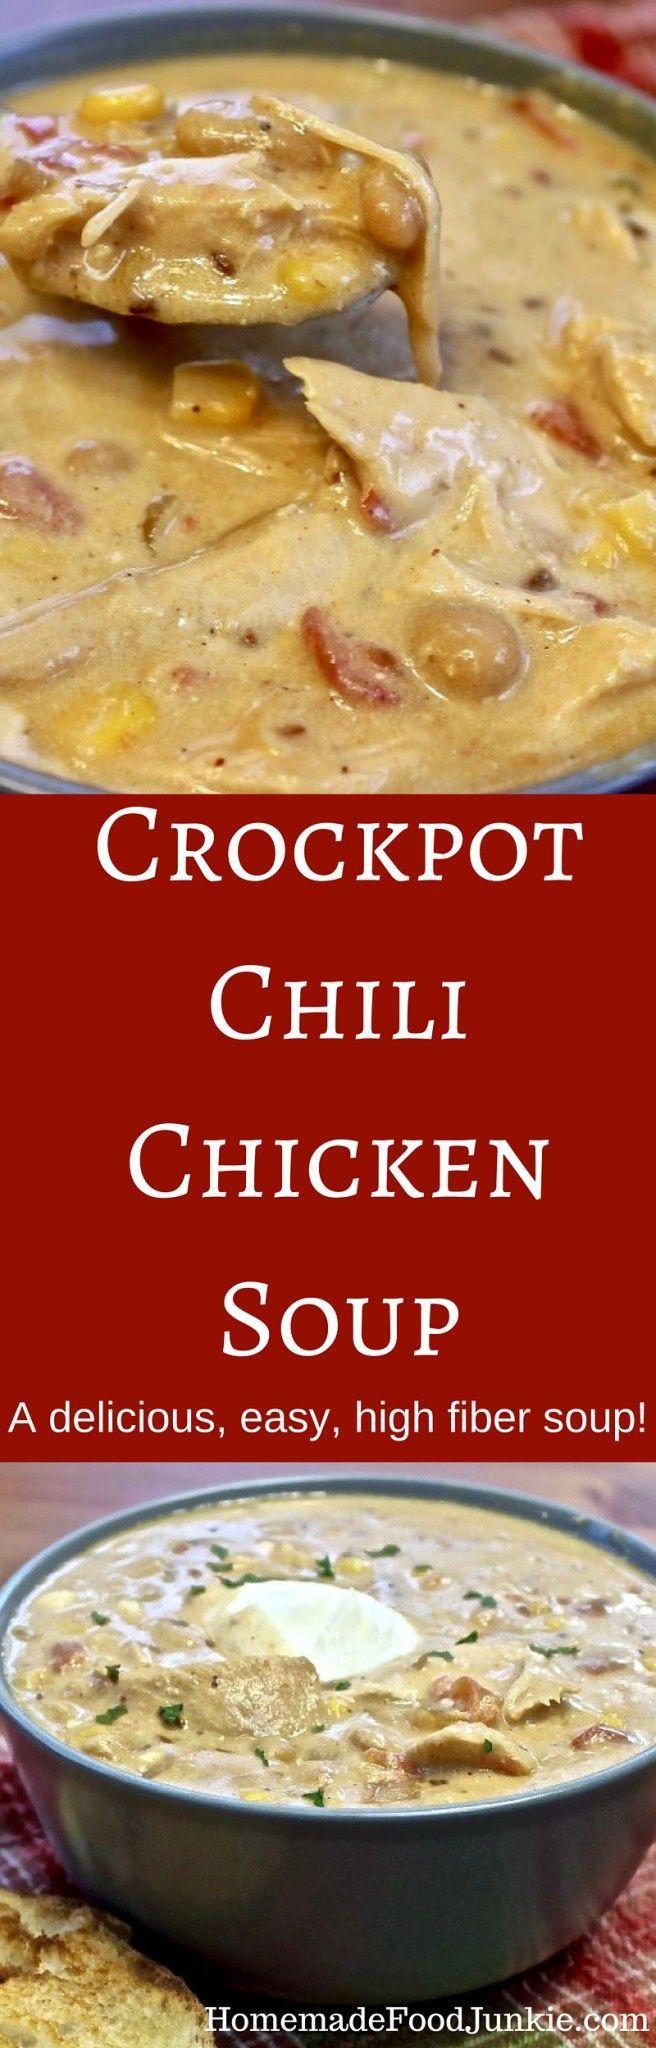 High Fiber Chicken Recipes  Crockpot Chili Chicken Soup A delicious easy high fiber